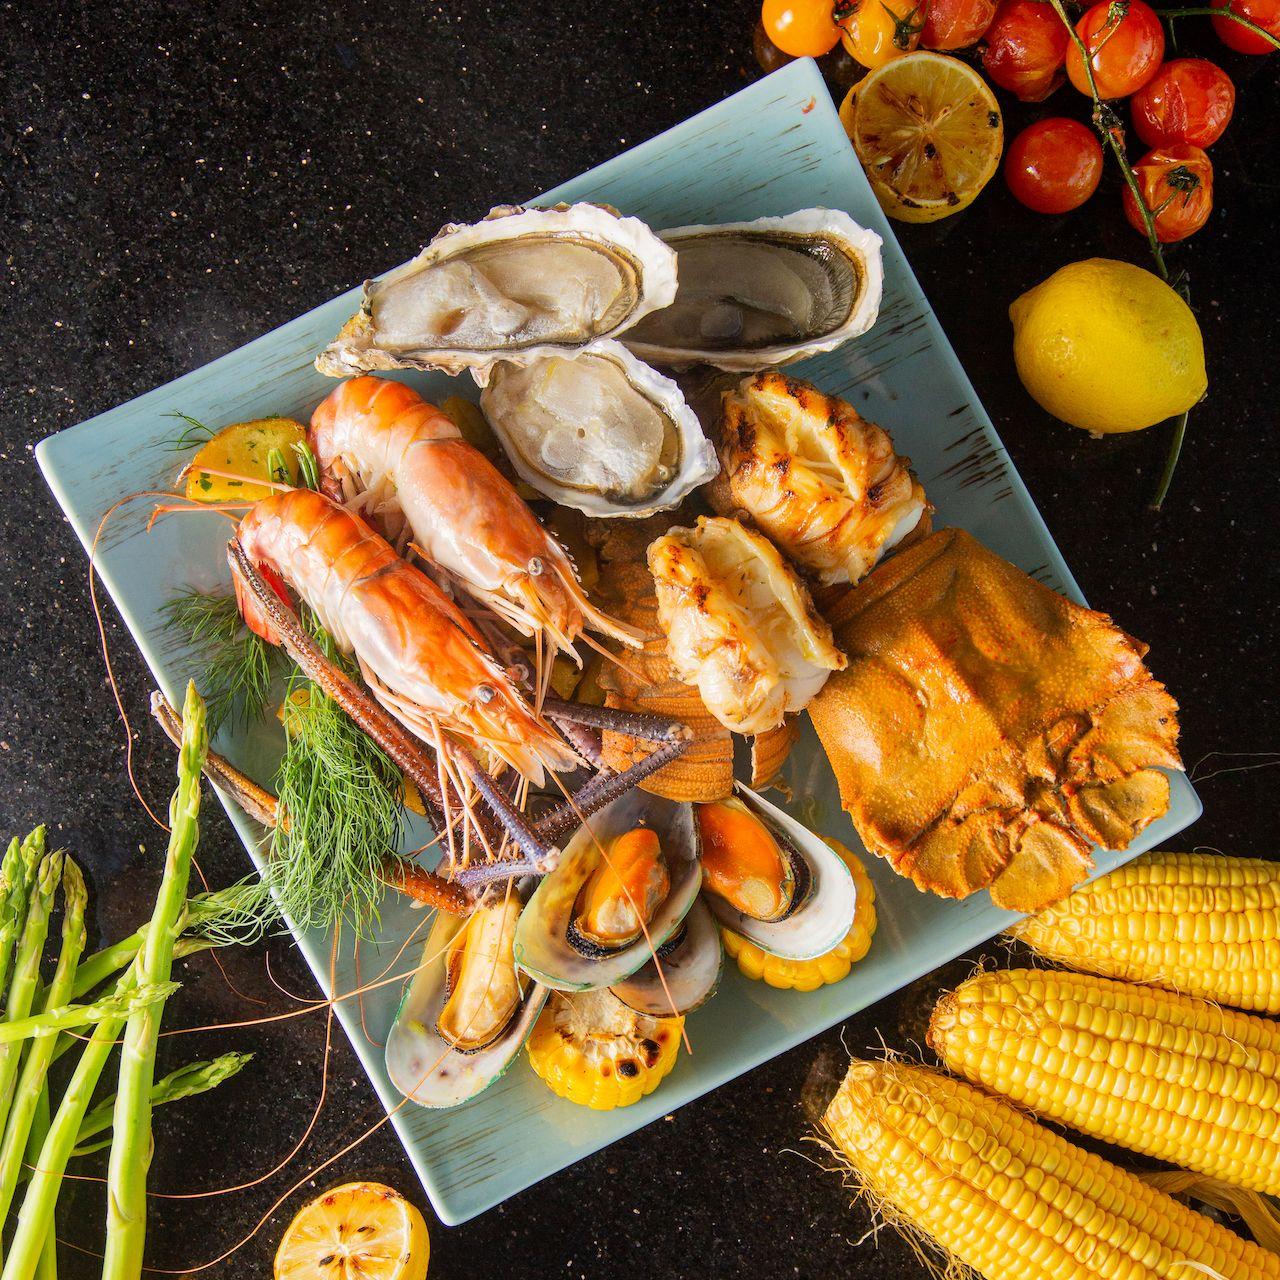 Where To Eat For Easter 2021: Sofitel Manila's Sunset Bar